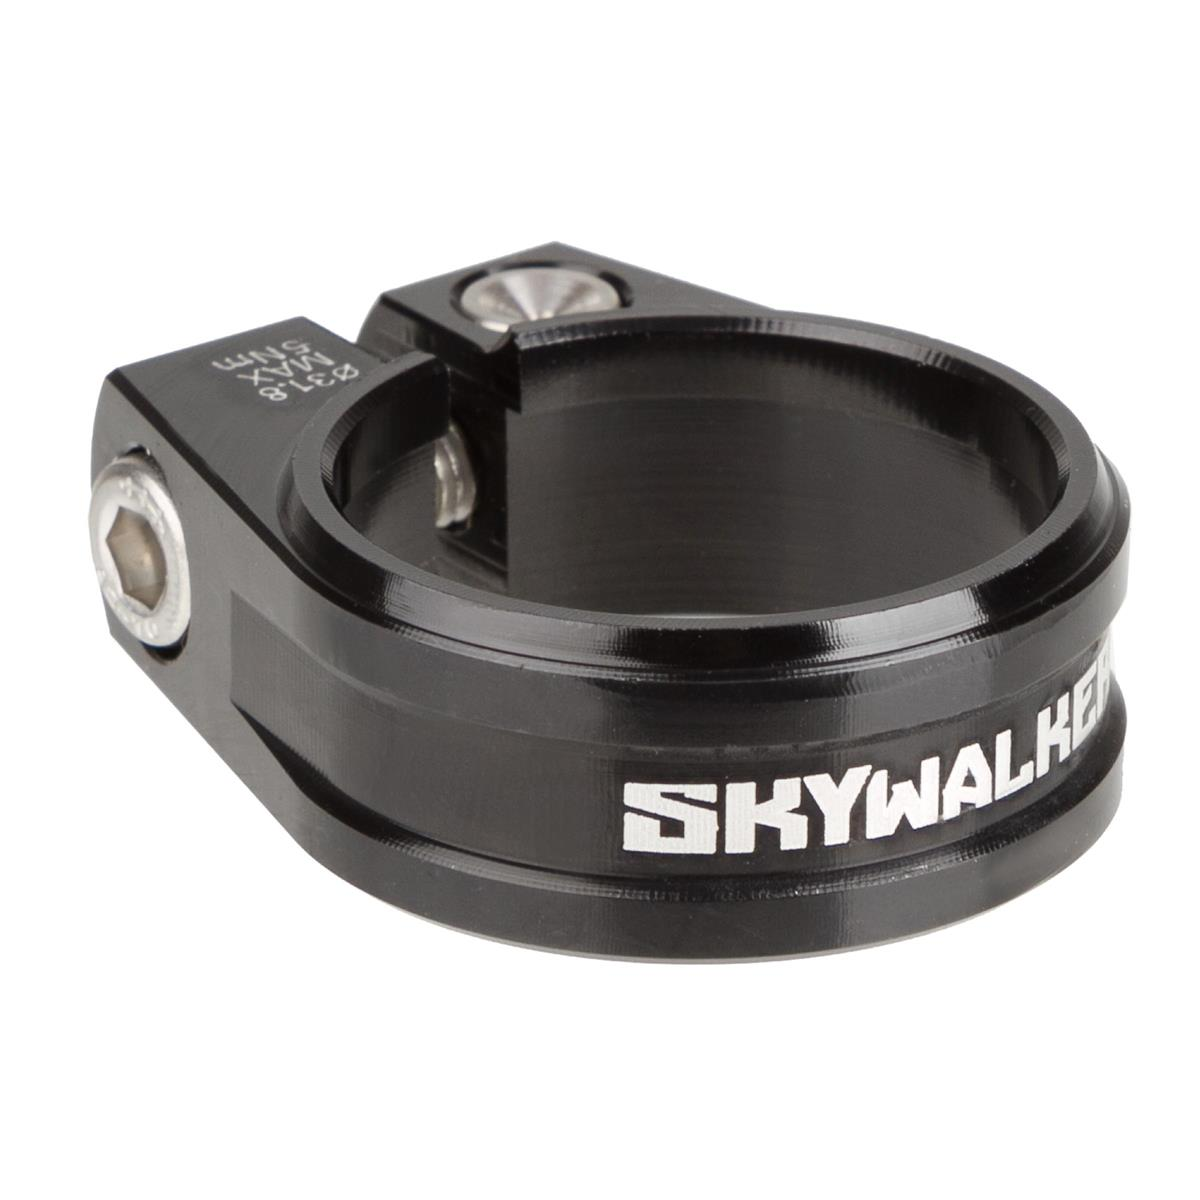 Sixpack Sattelklemme Skywalker 31.8 Schwarz, CNC Aluminium, 31.8 mm